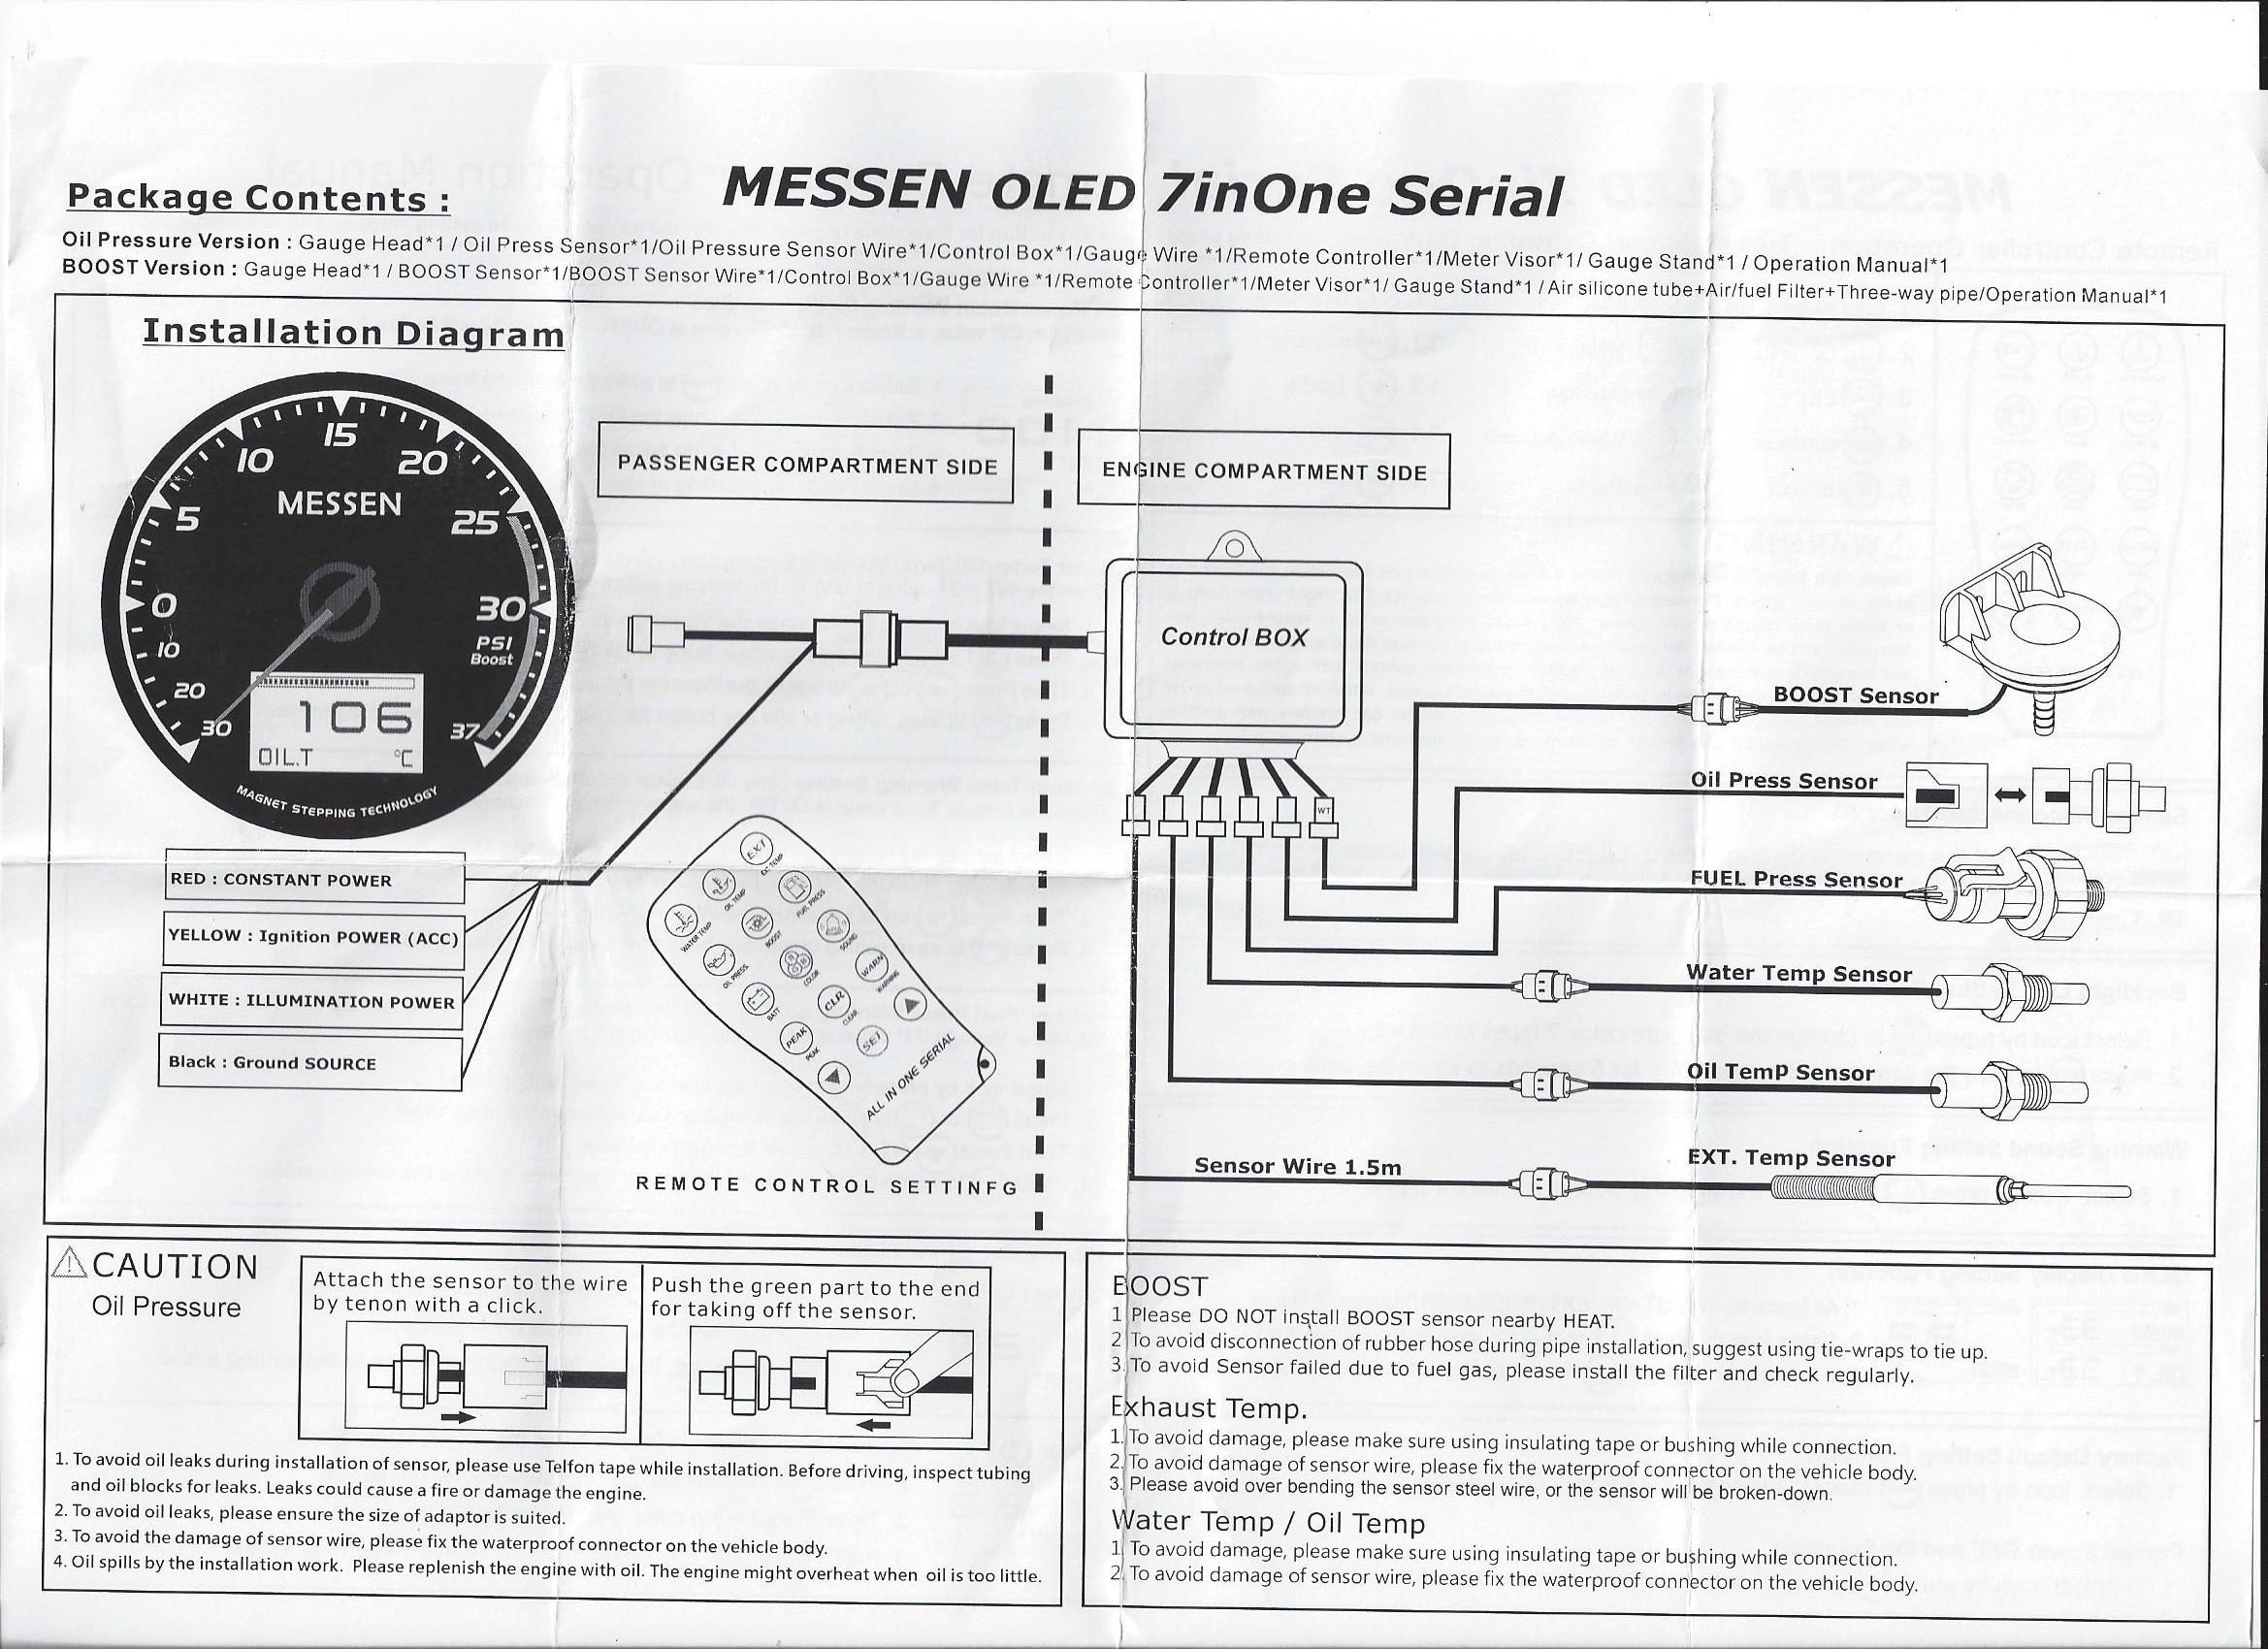 Dragon Gauge Wiring Diagram 2012 Infiniti G37 Fog Light Tach Water Temp Electrical Diagrams On